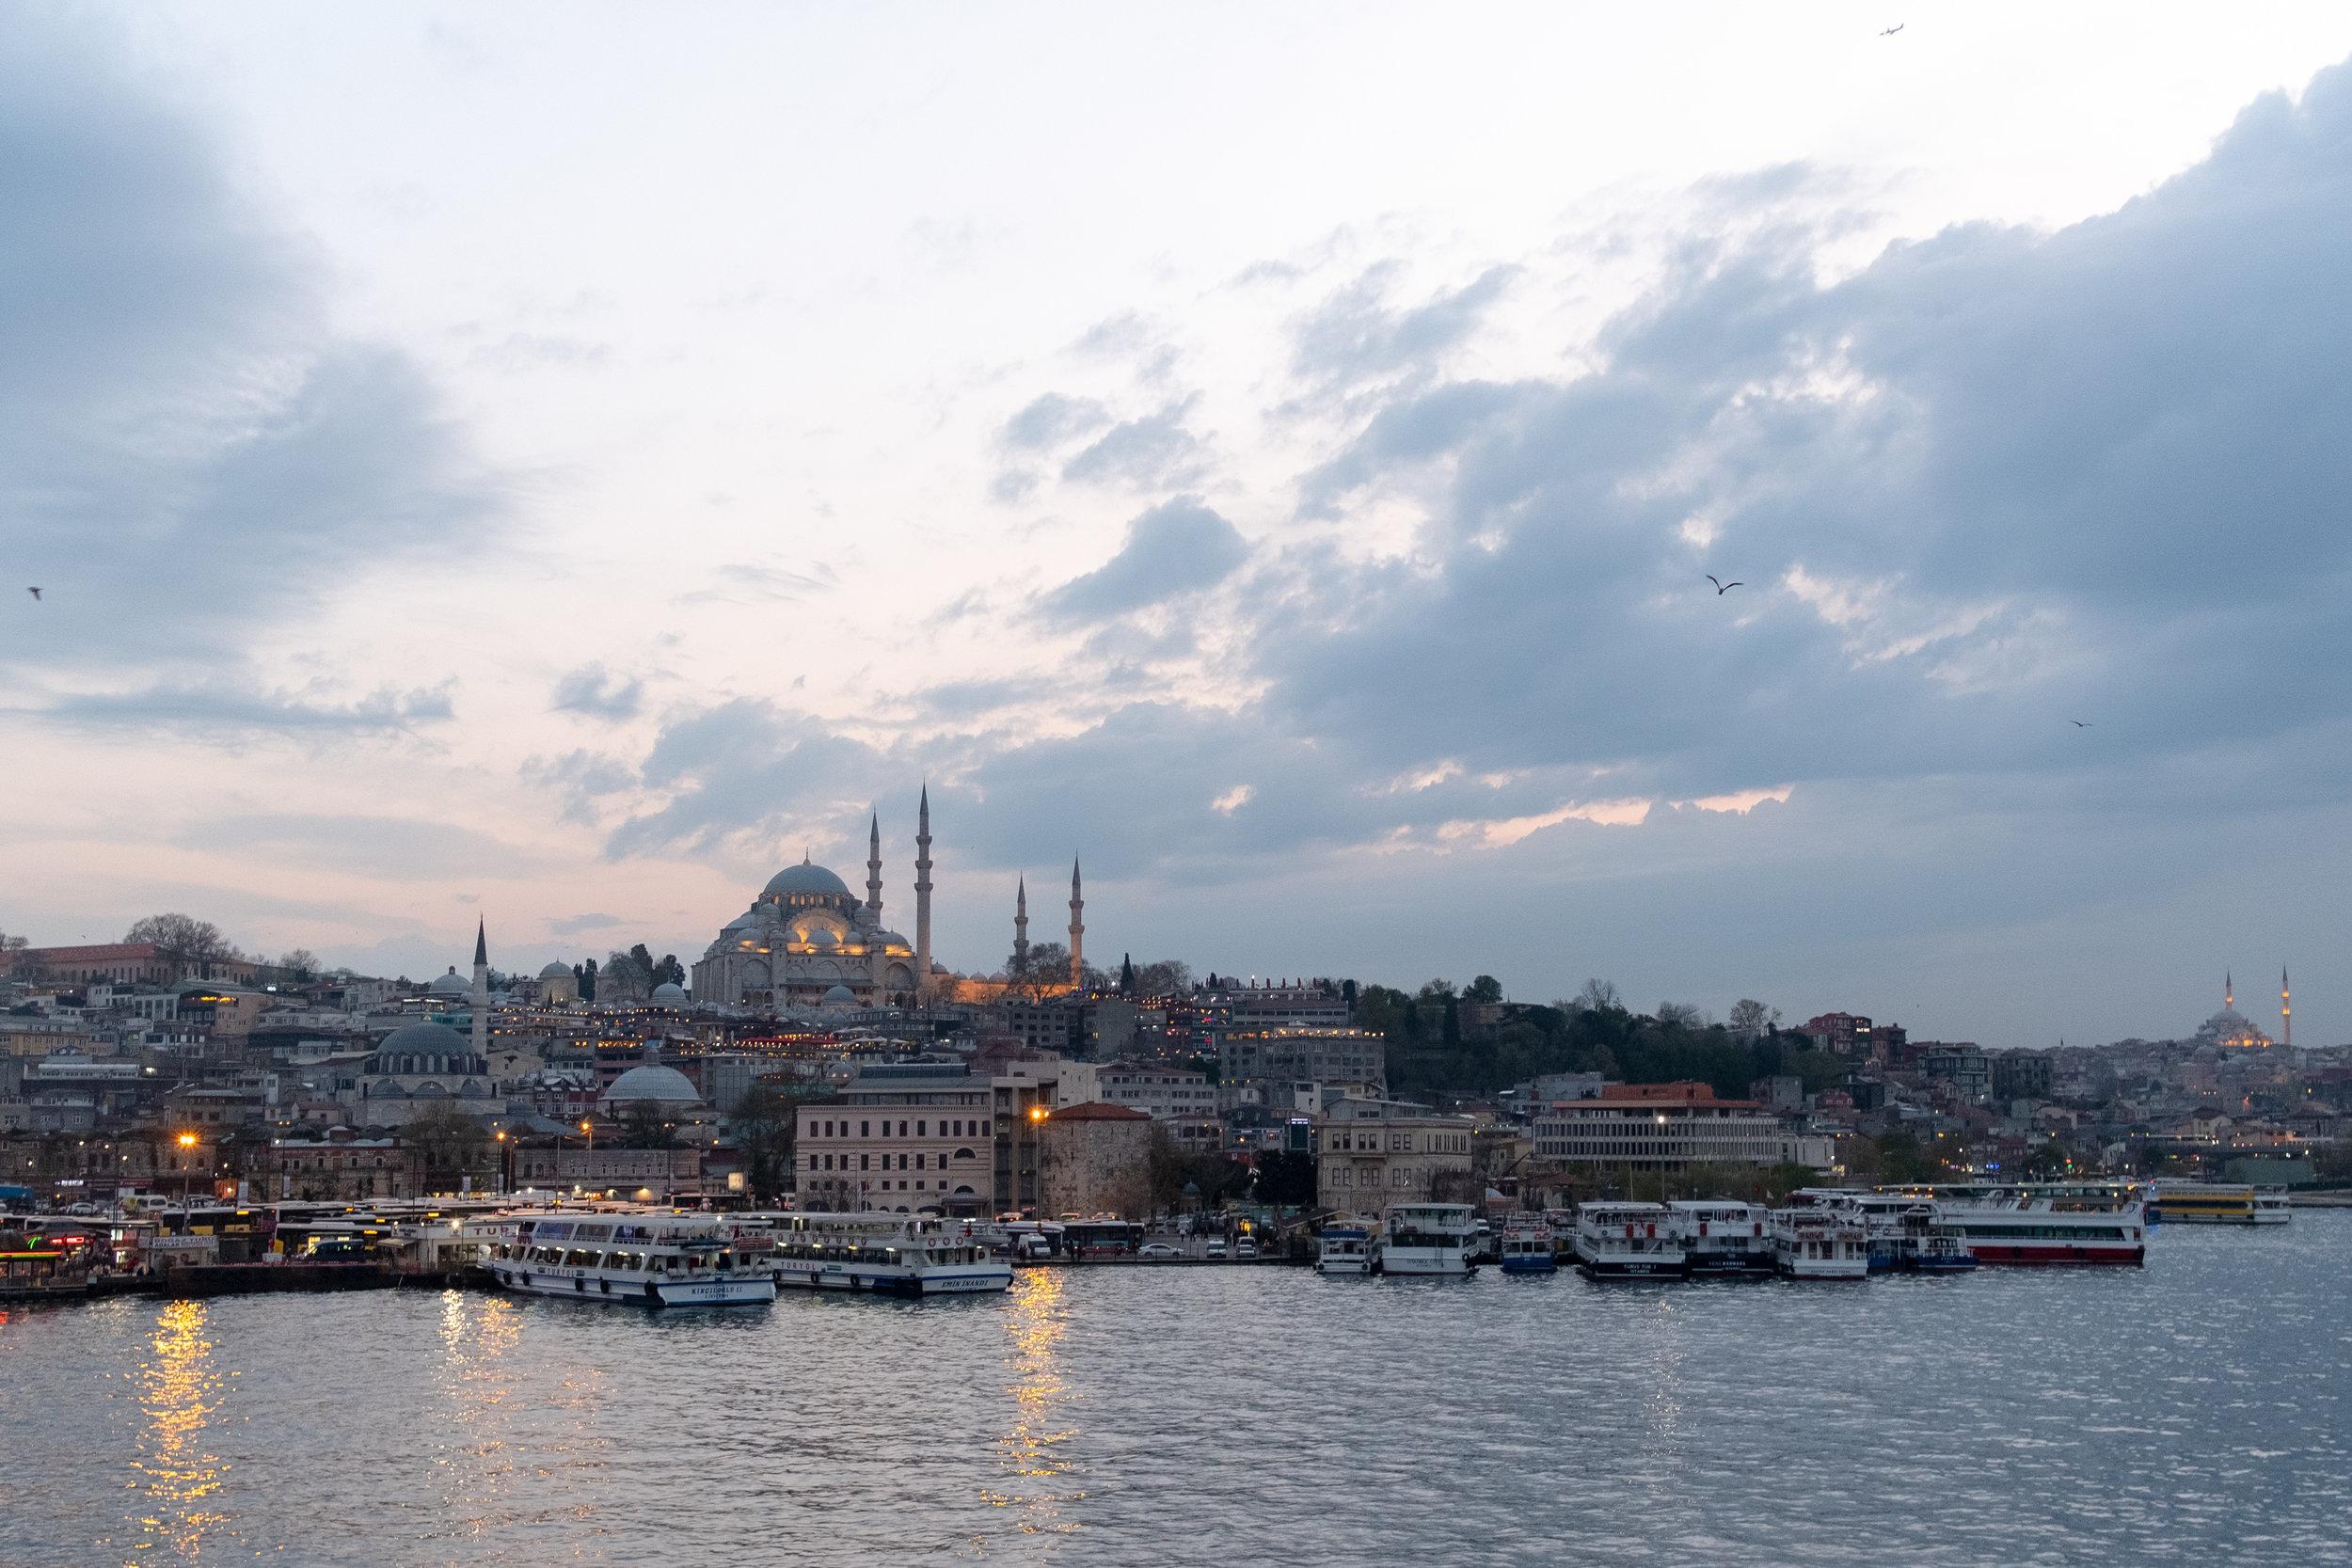 20190408 - Turkey - 1554.JPG